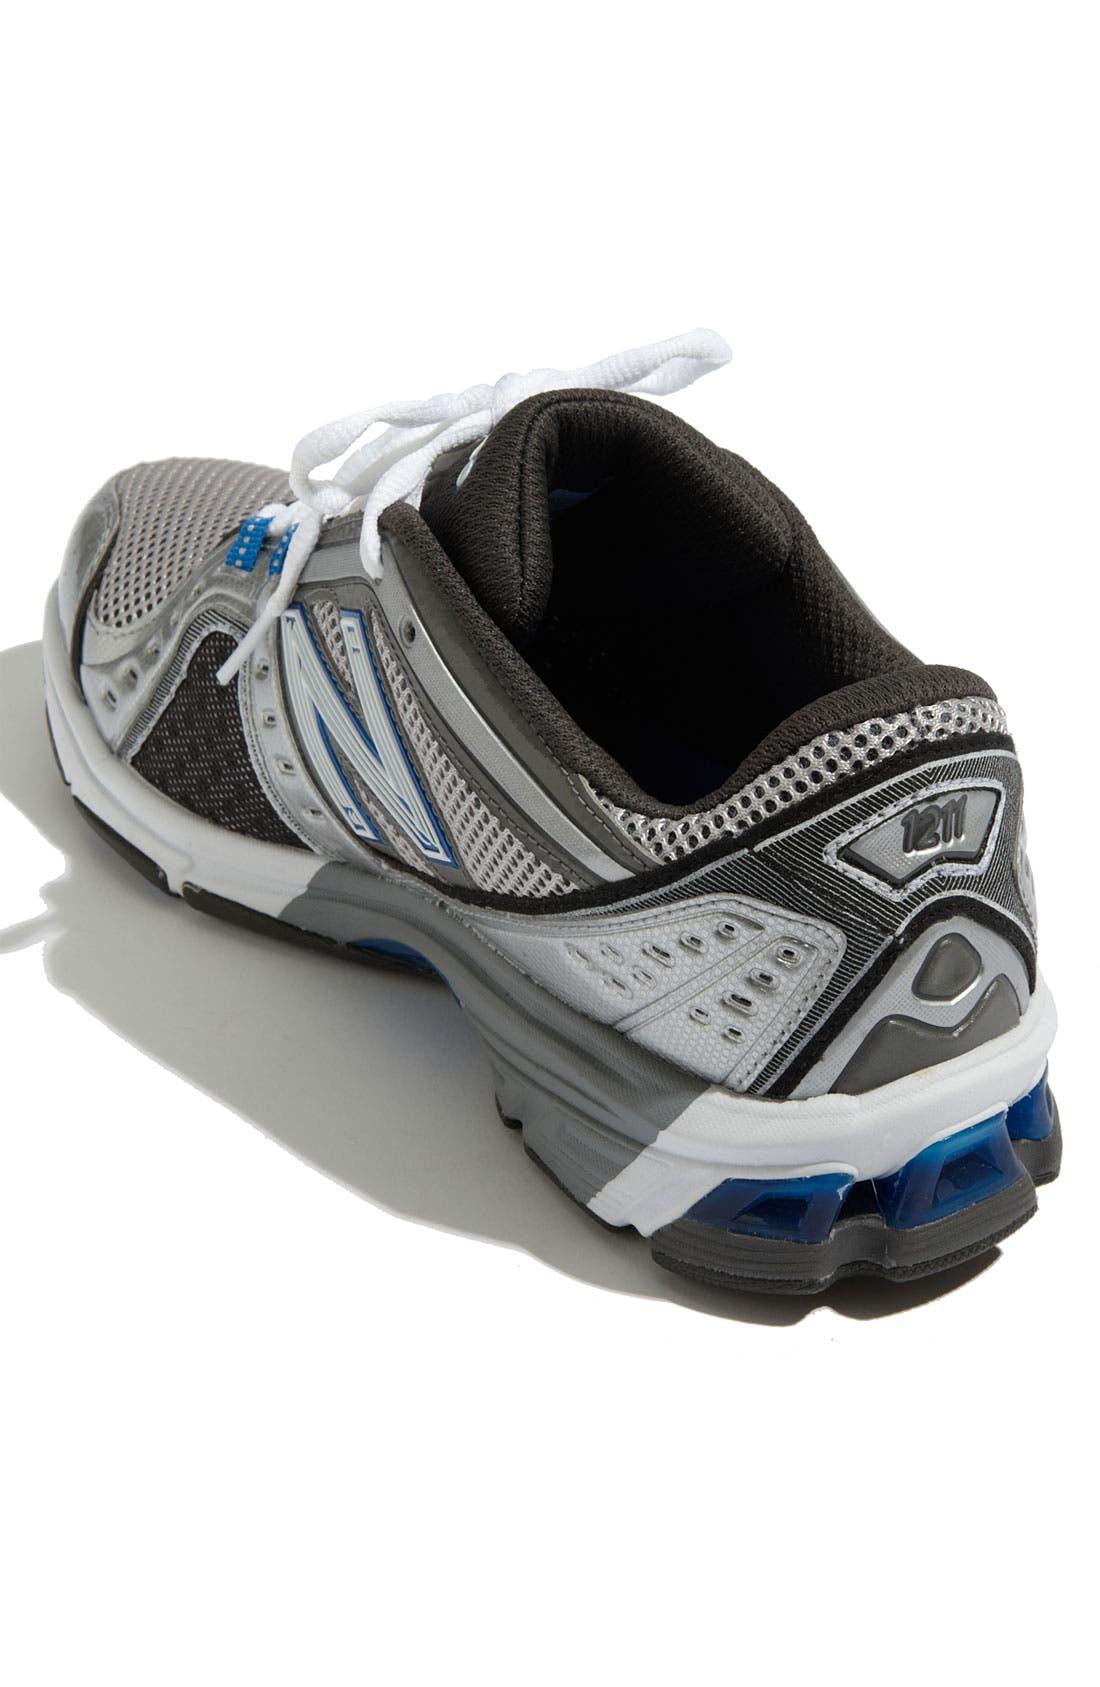 Alternate Image 2  - New Balance '1211' Training Shoe (Men) (Online Only)